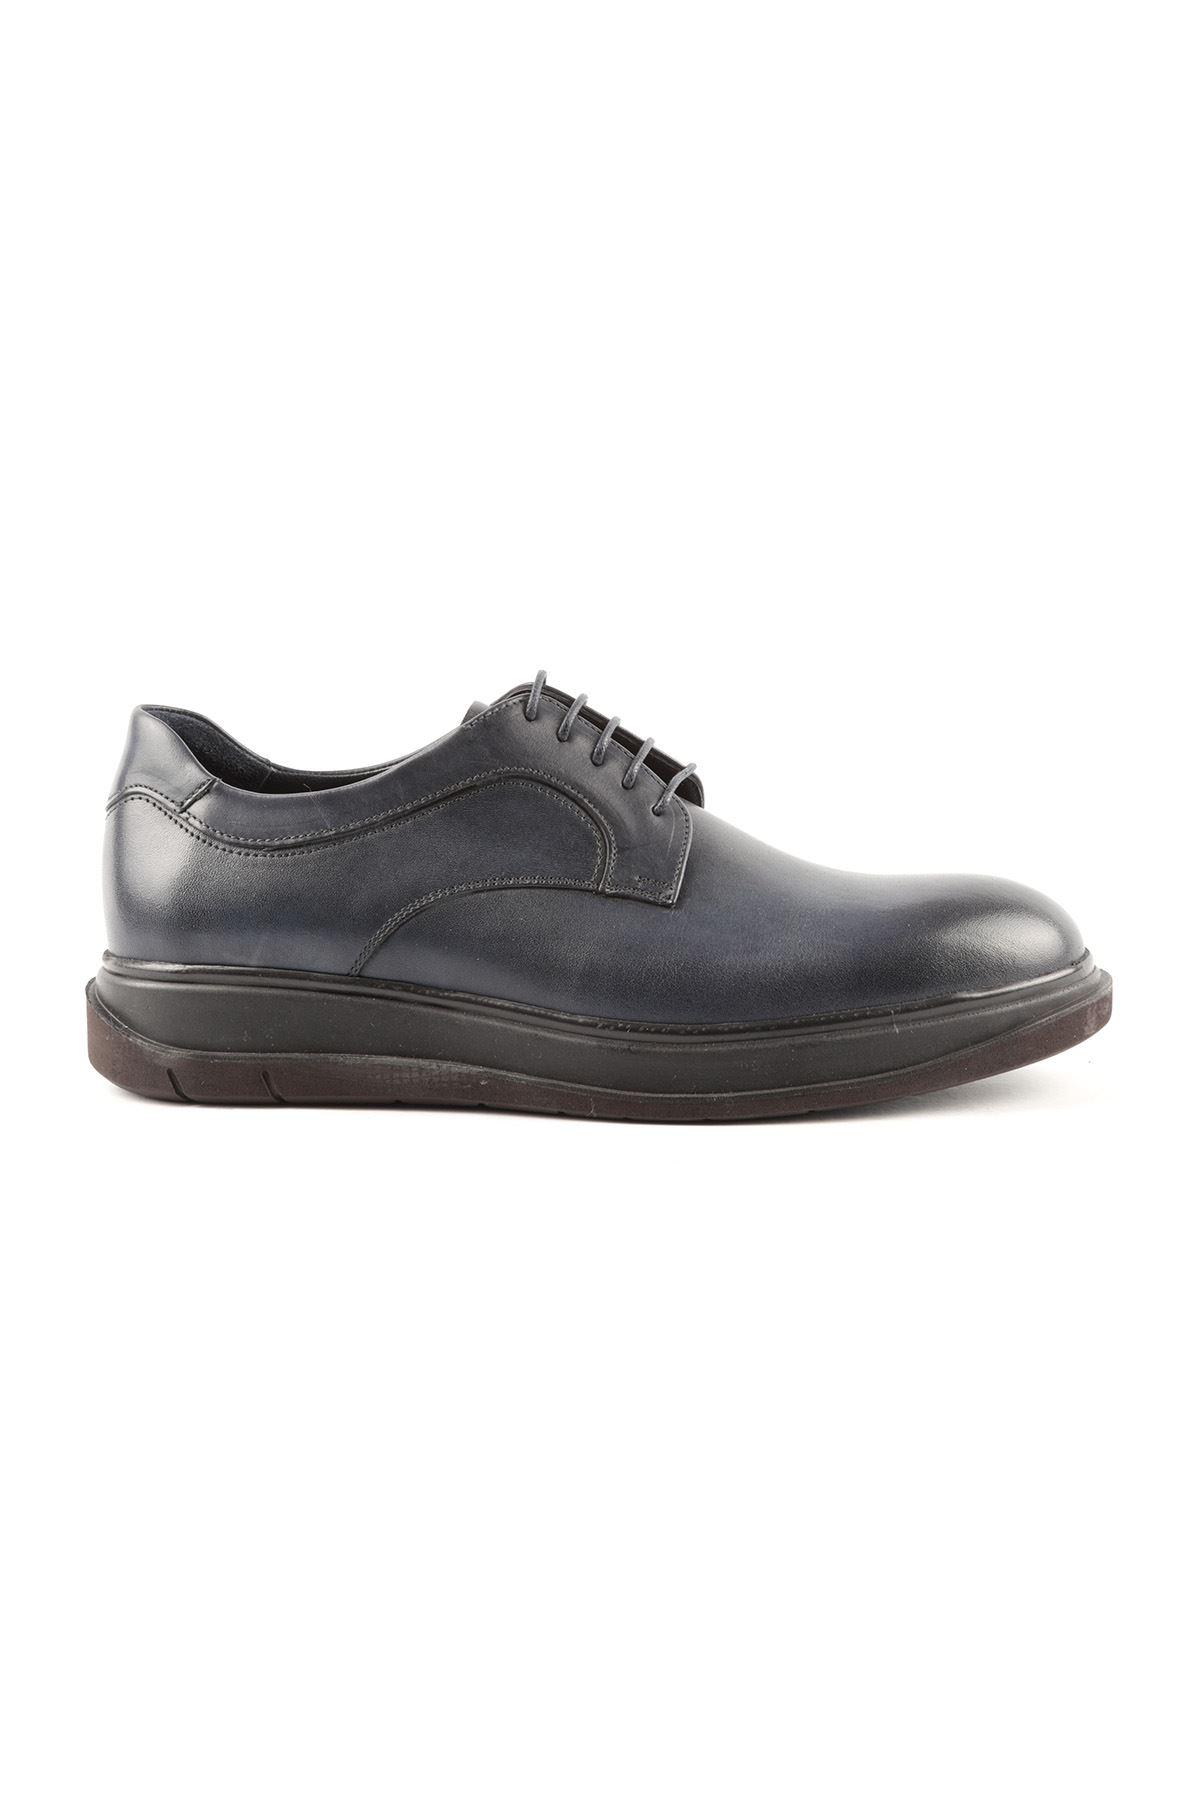 Libero L3103 EA Lacivert Klasik Ayakkabı